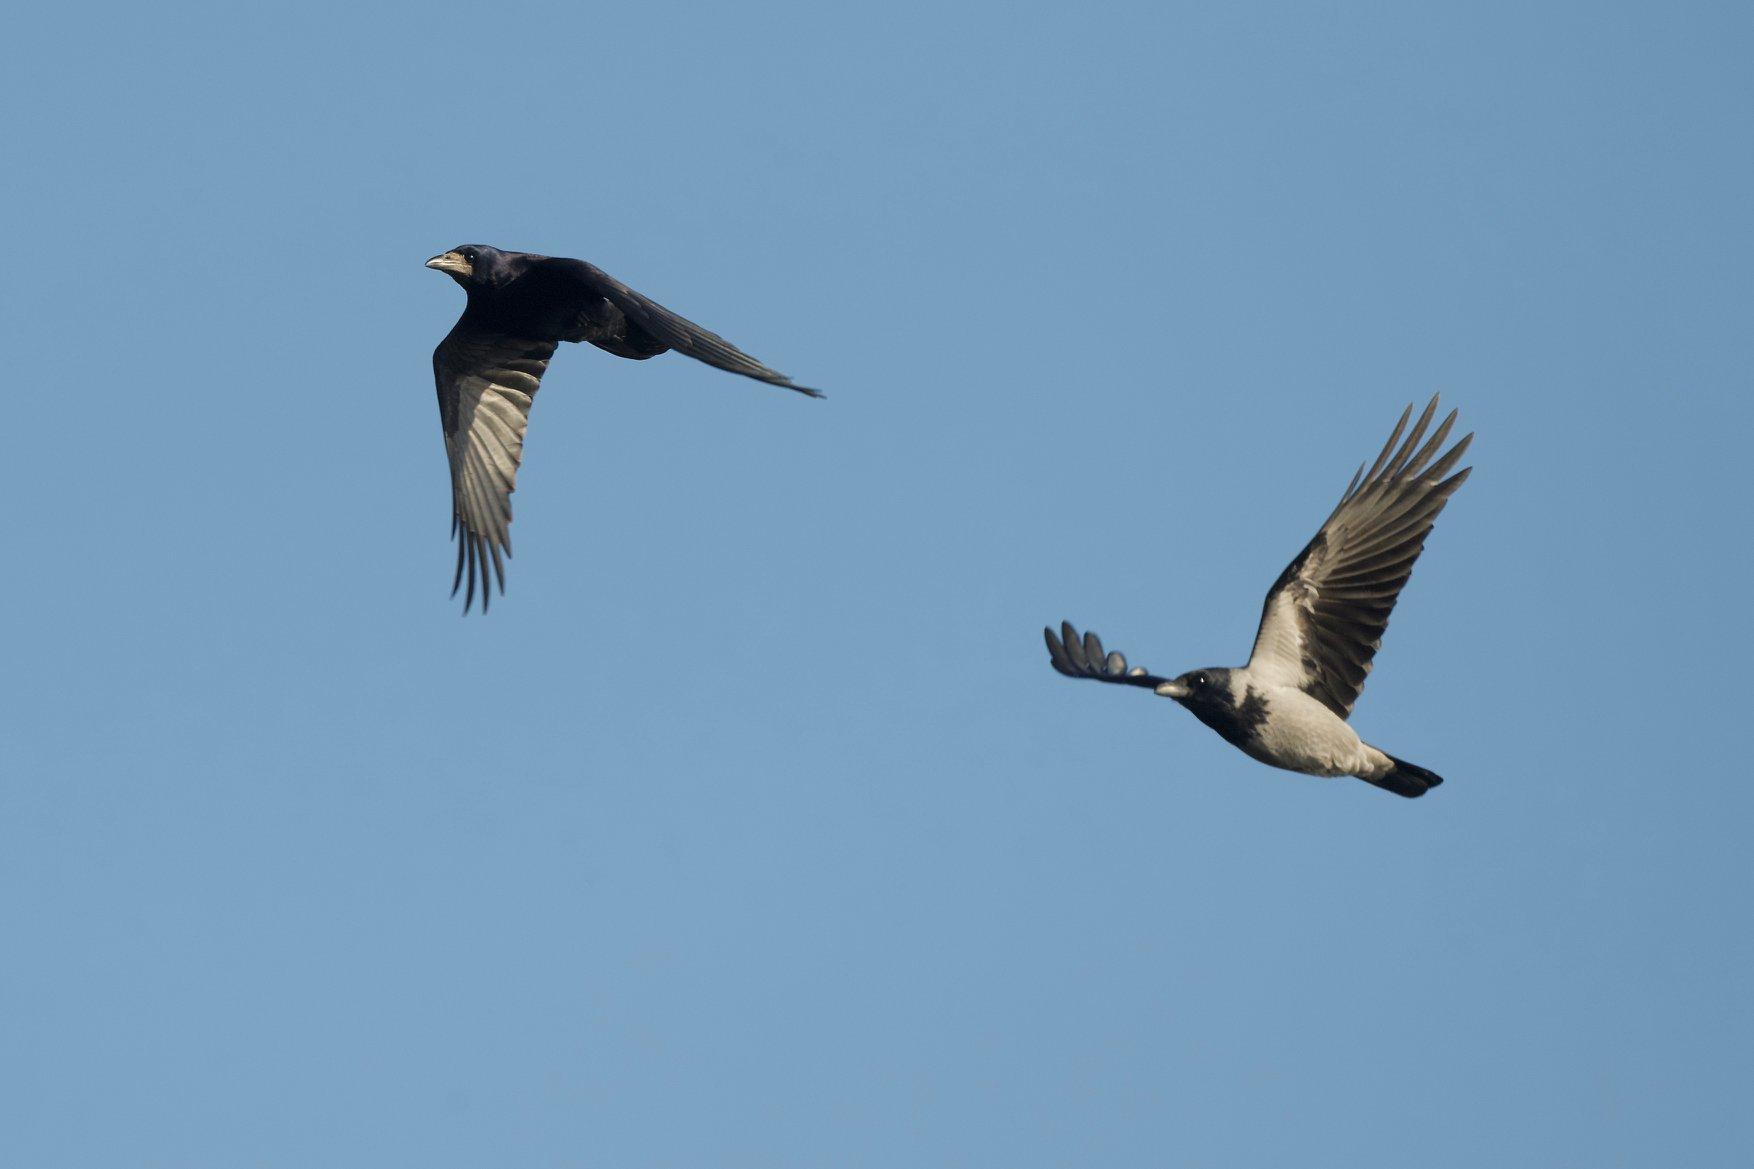 Gawron i wrona siwa